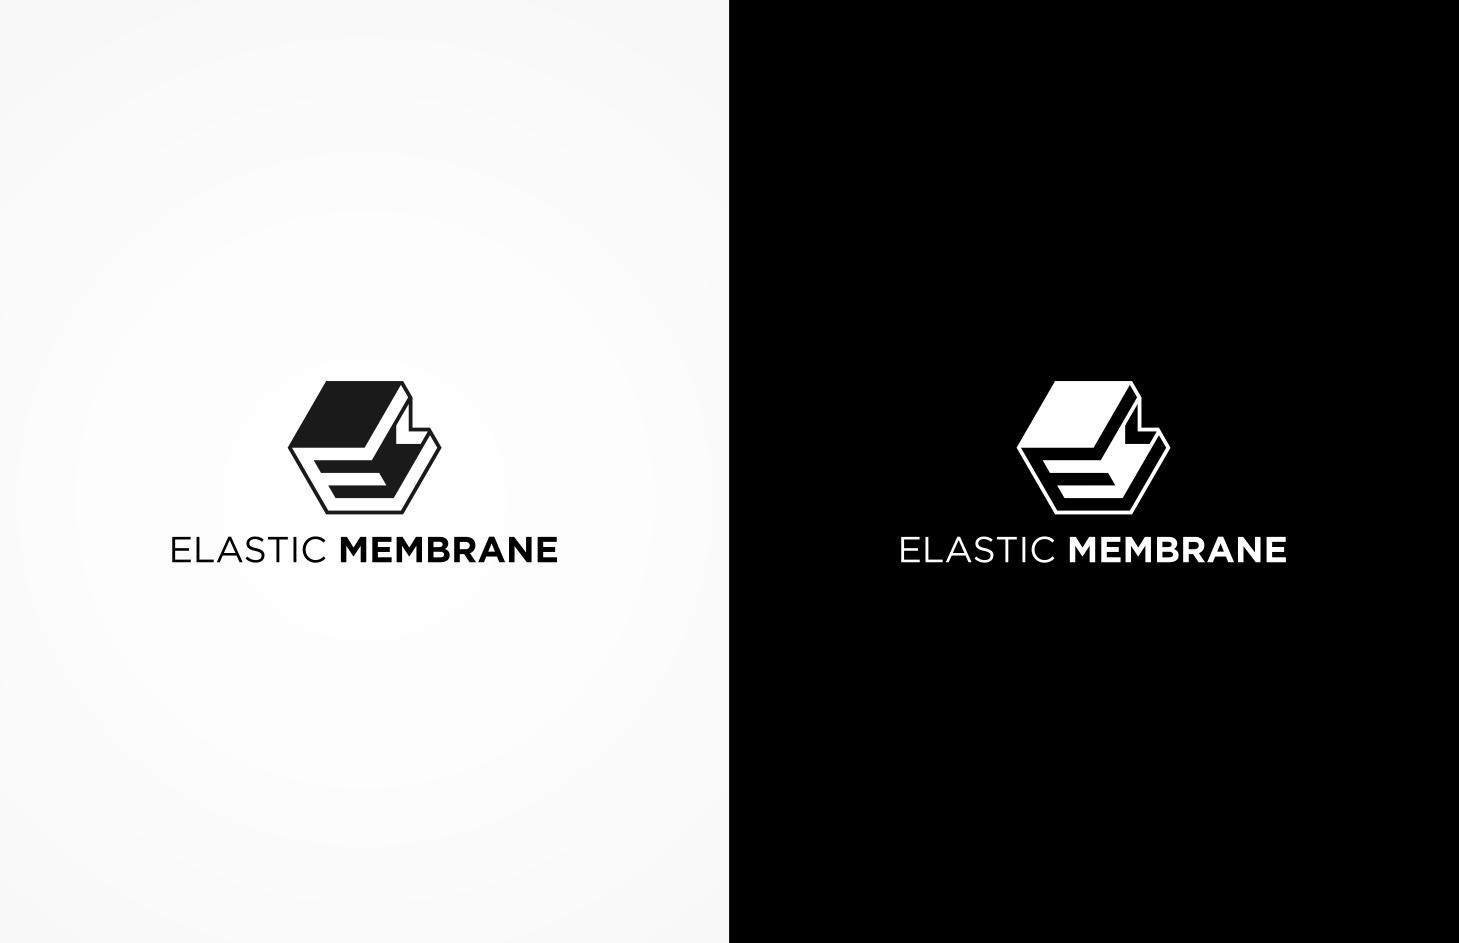 Create a modern geometric techno-style logo for Elastic Membrane